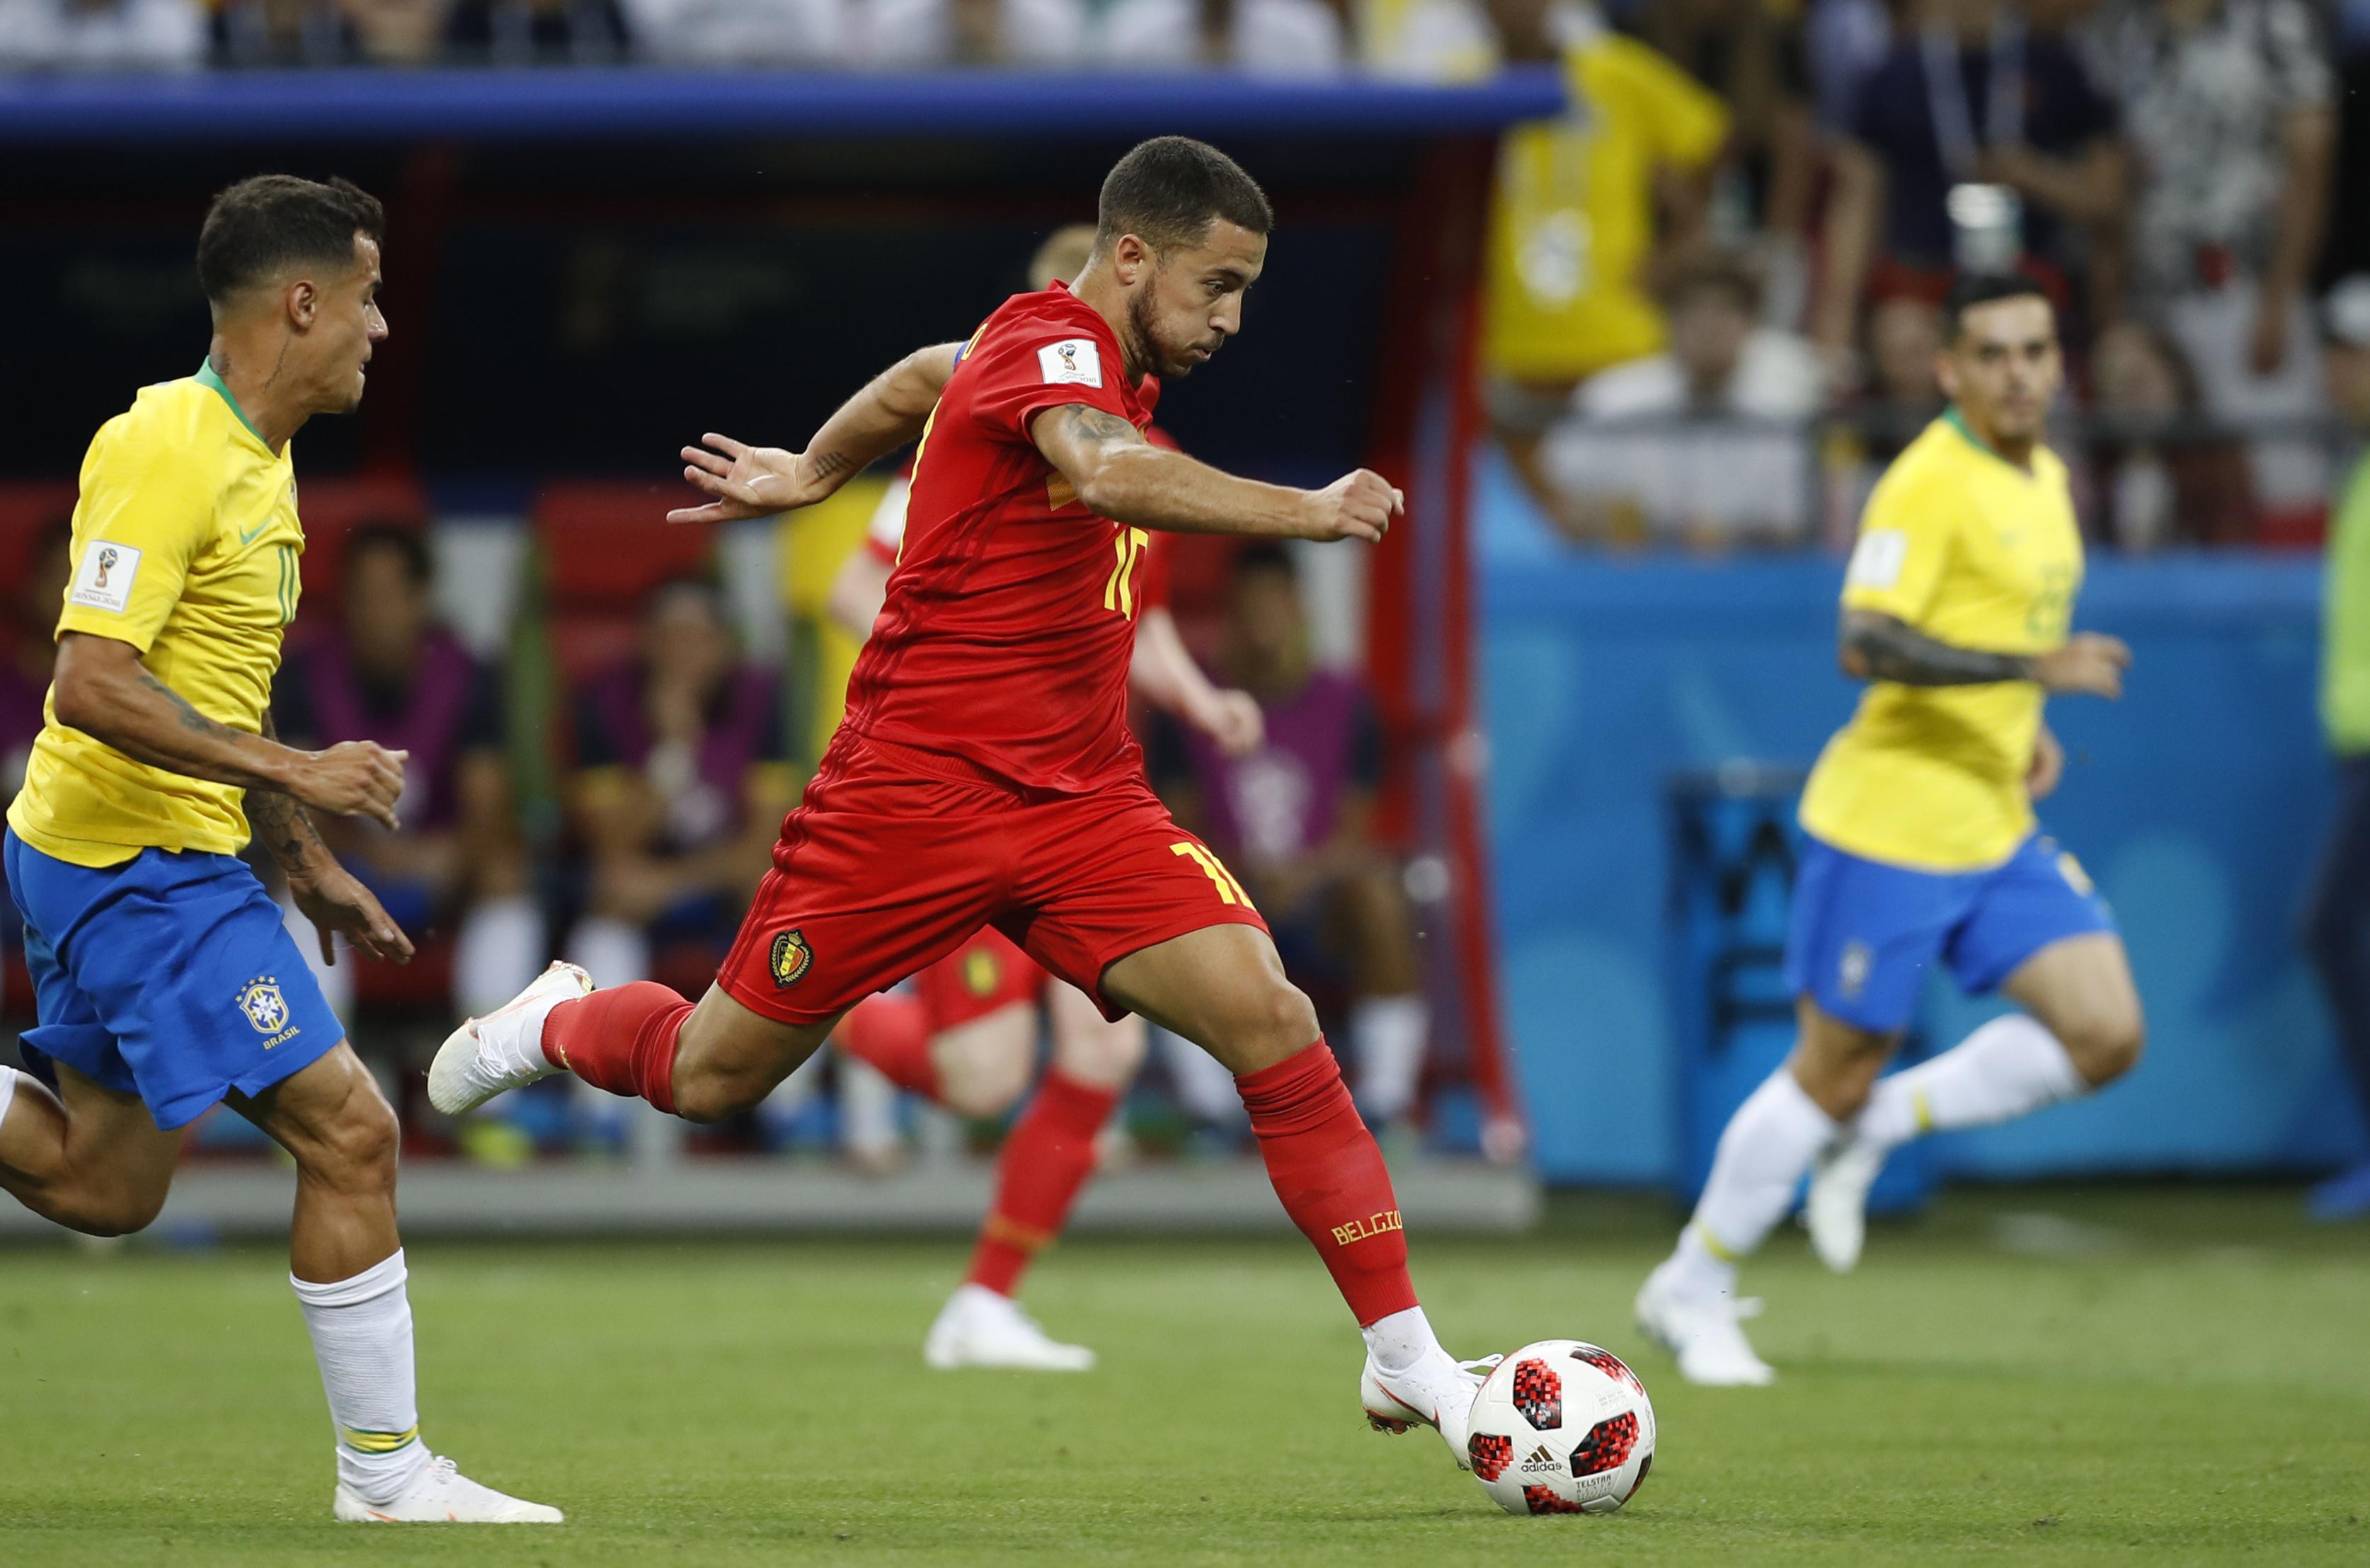 Hazard on the ball. Image: PA